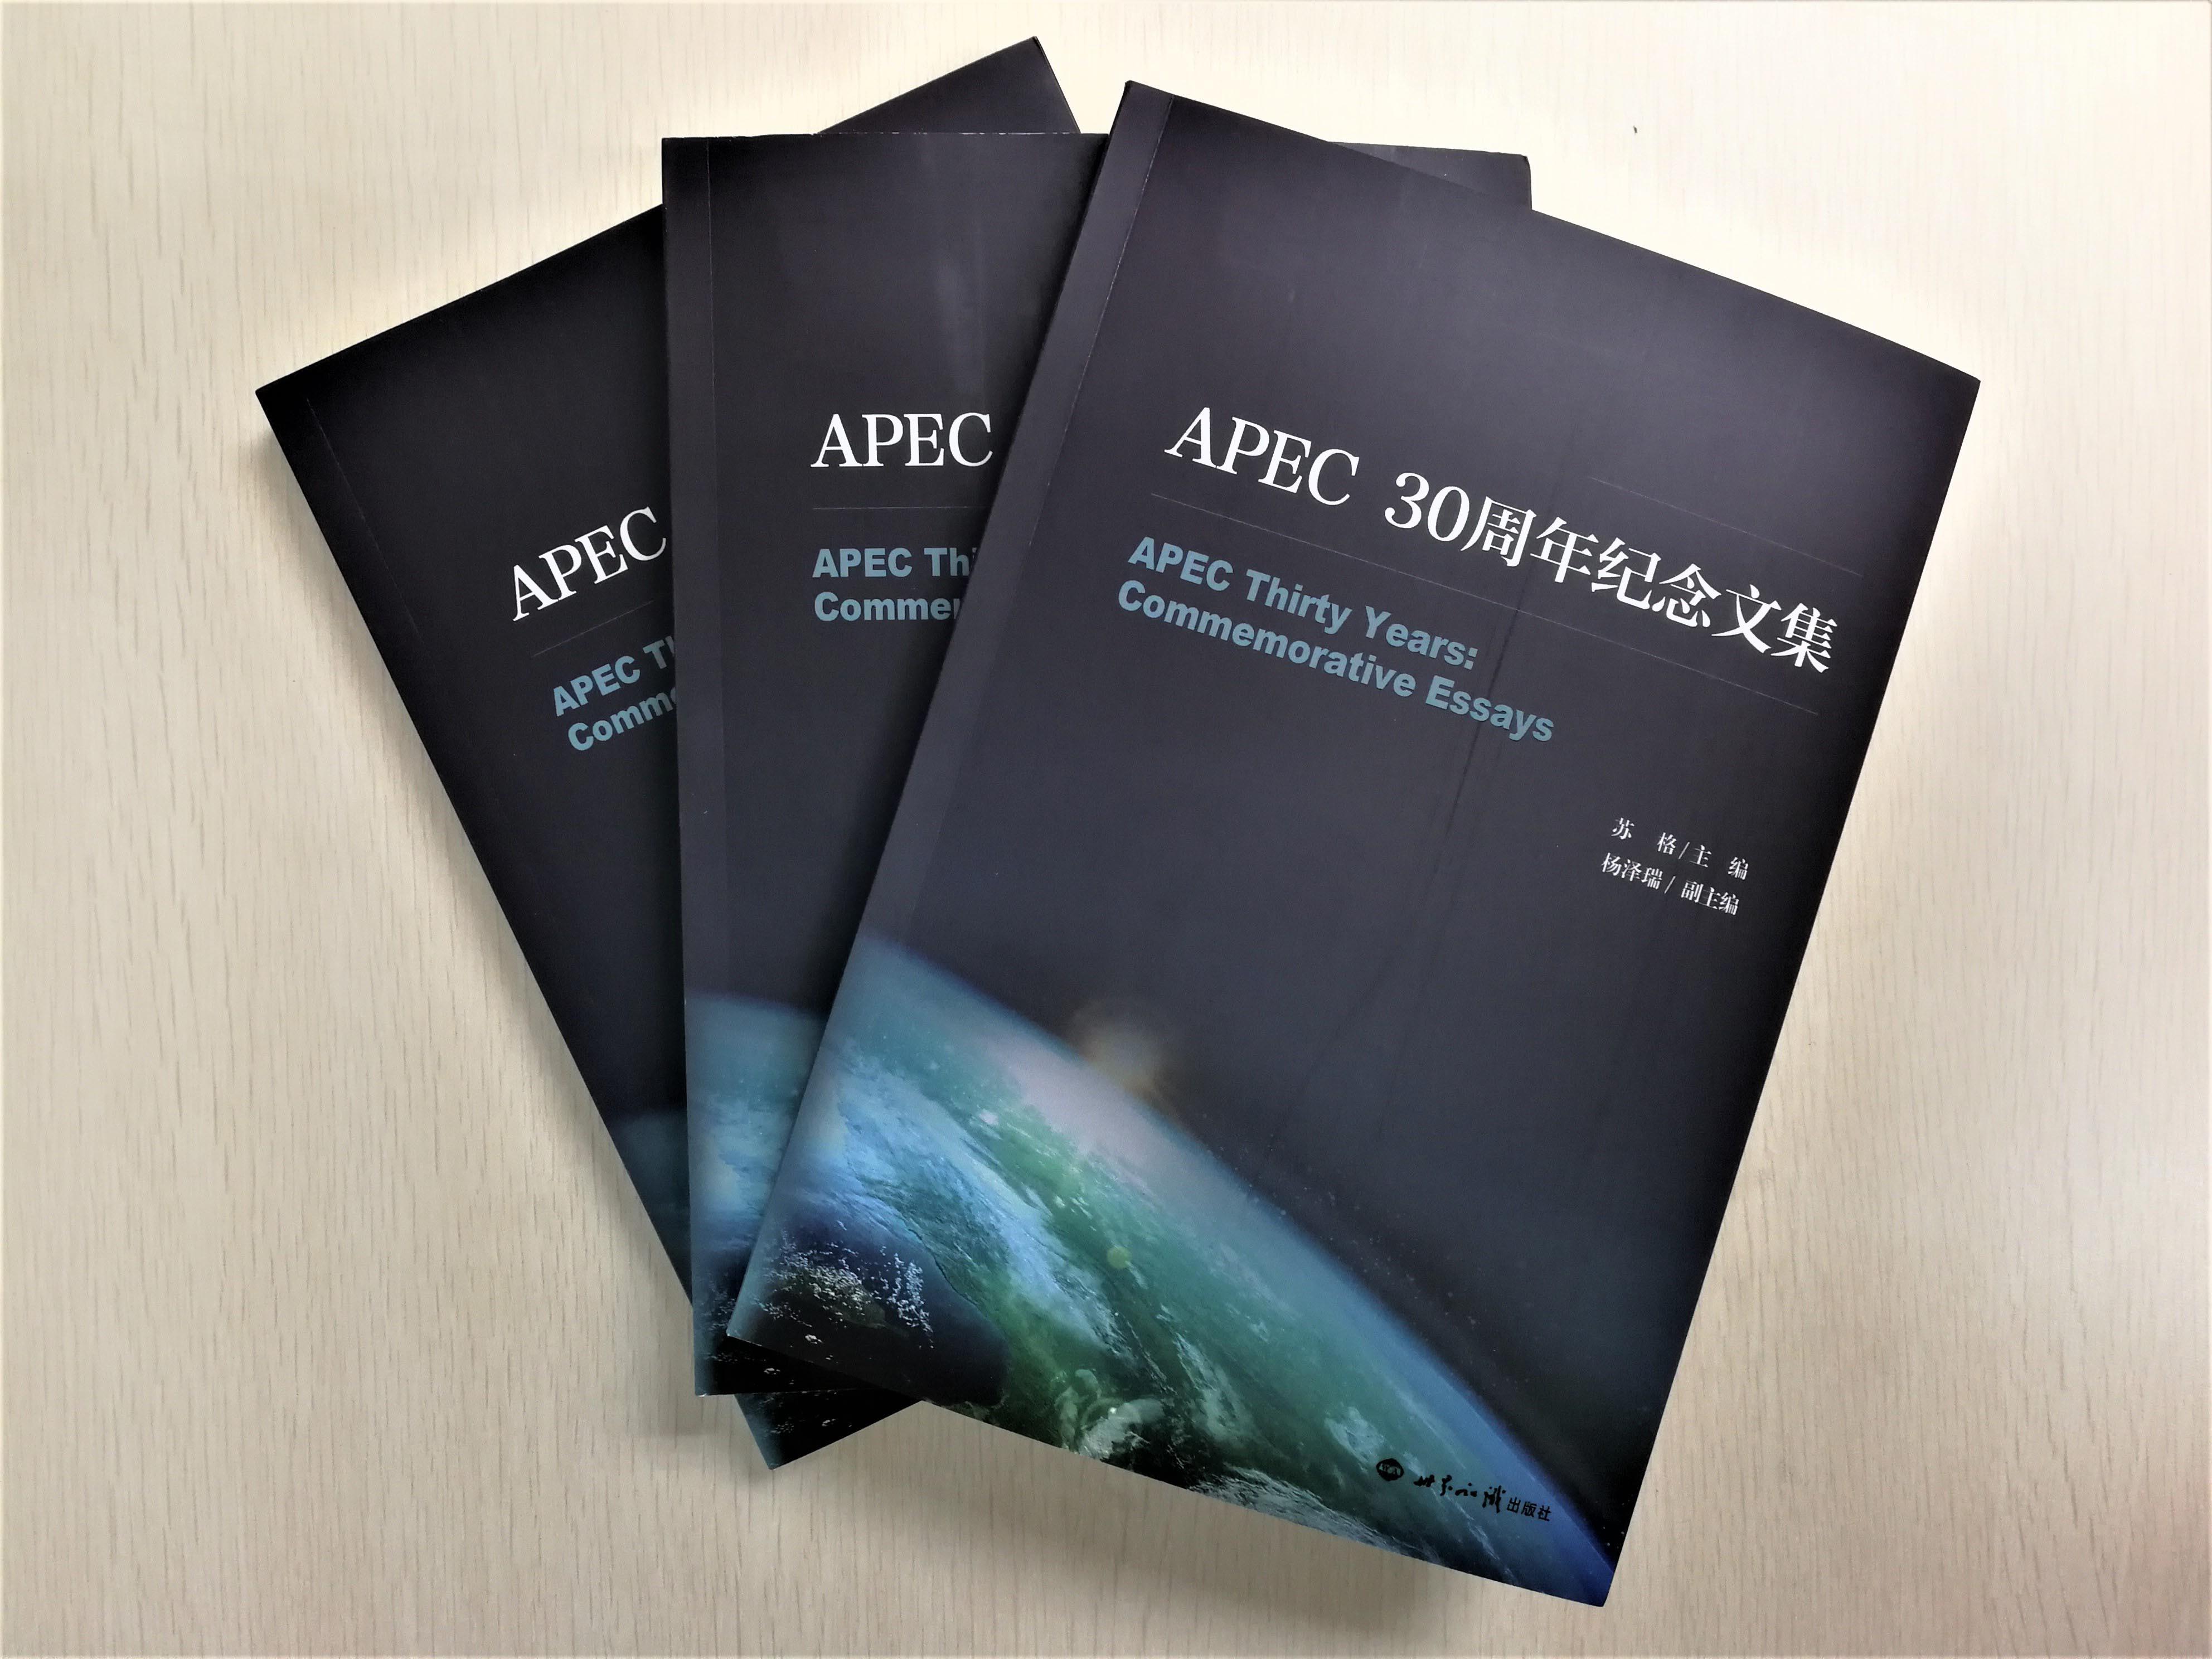 2020 APEC Thirty Years Commemorative Essays